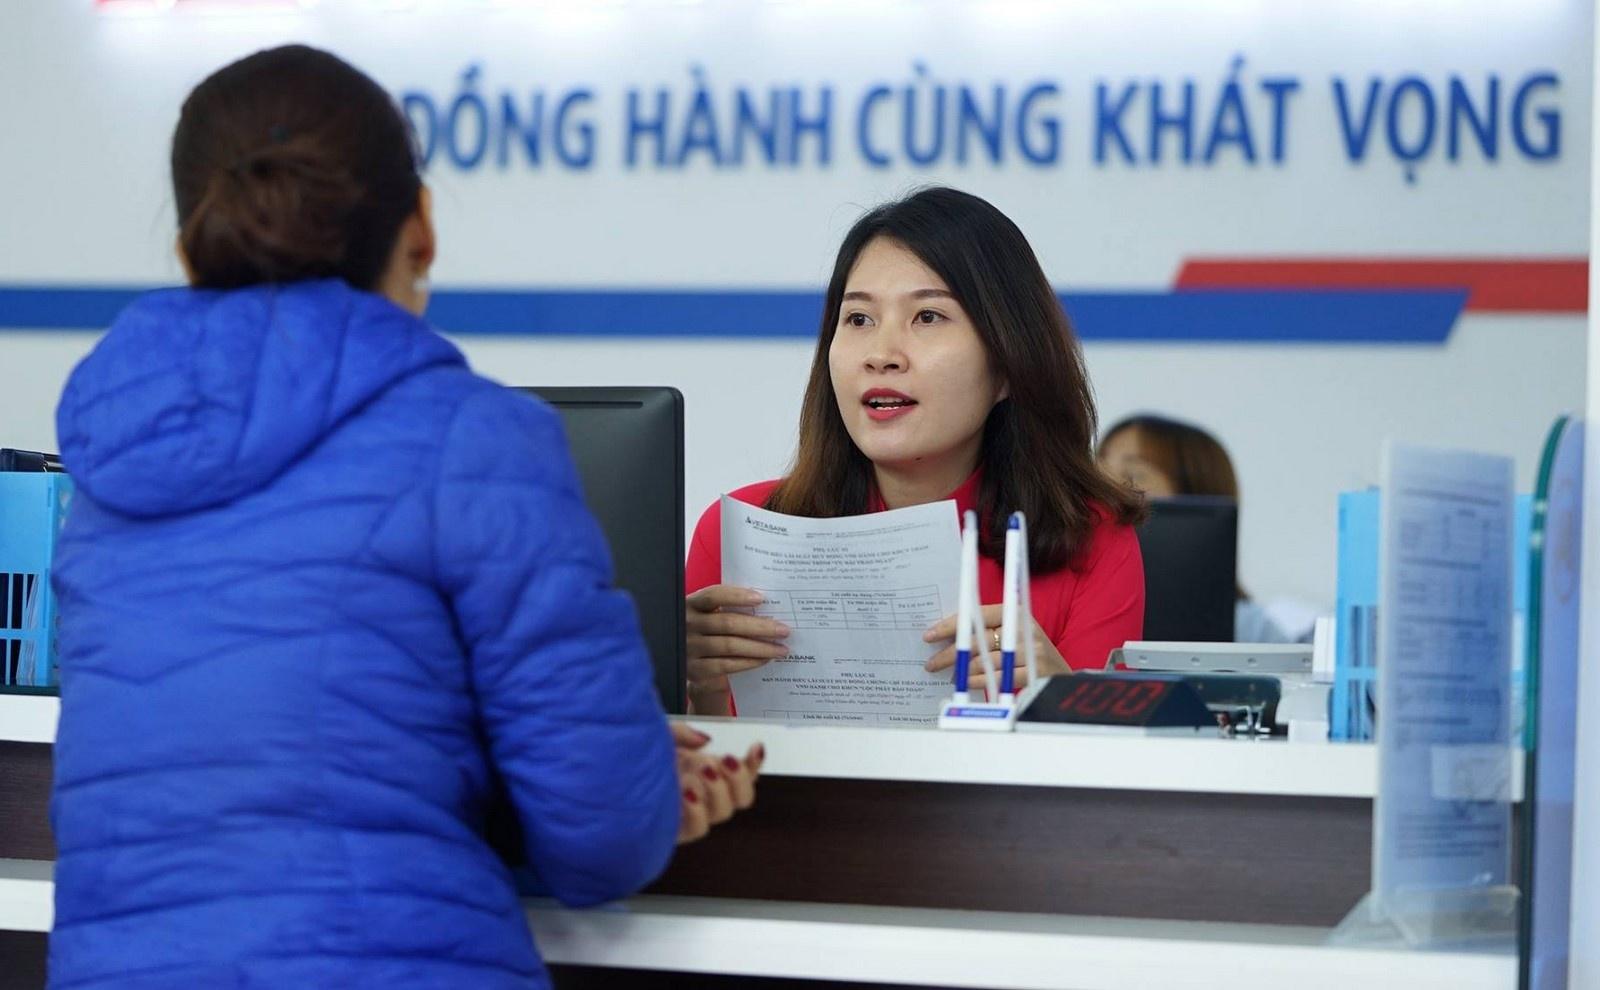 tang kha nang tiep can tin dung cho doanh nghiep nho